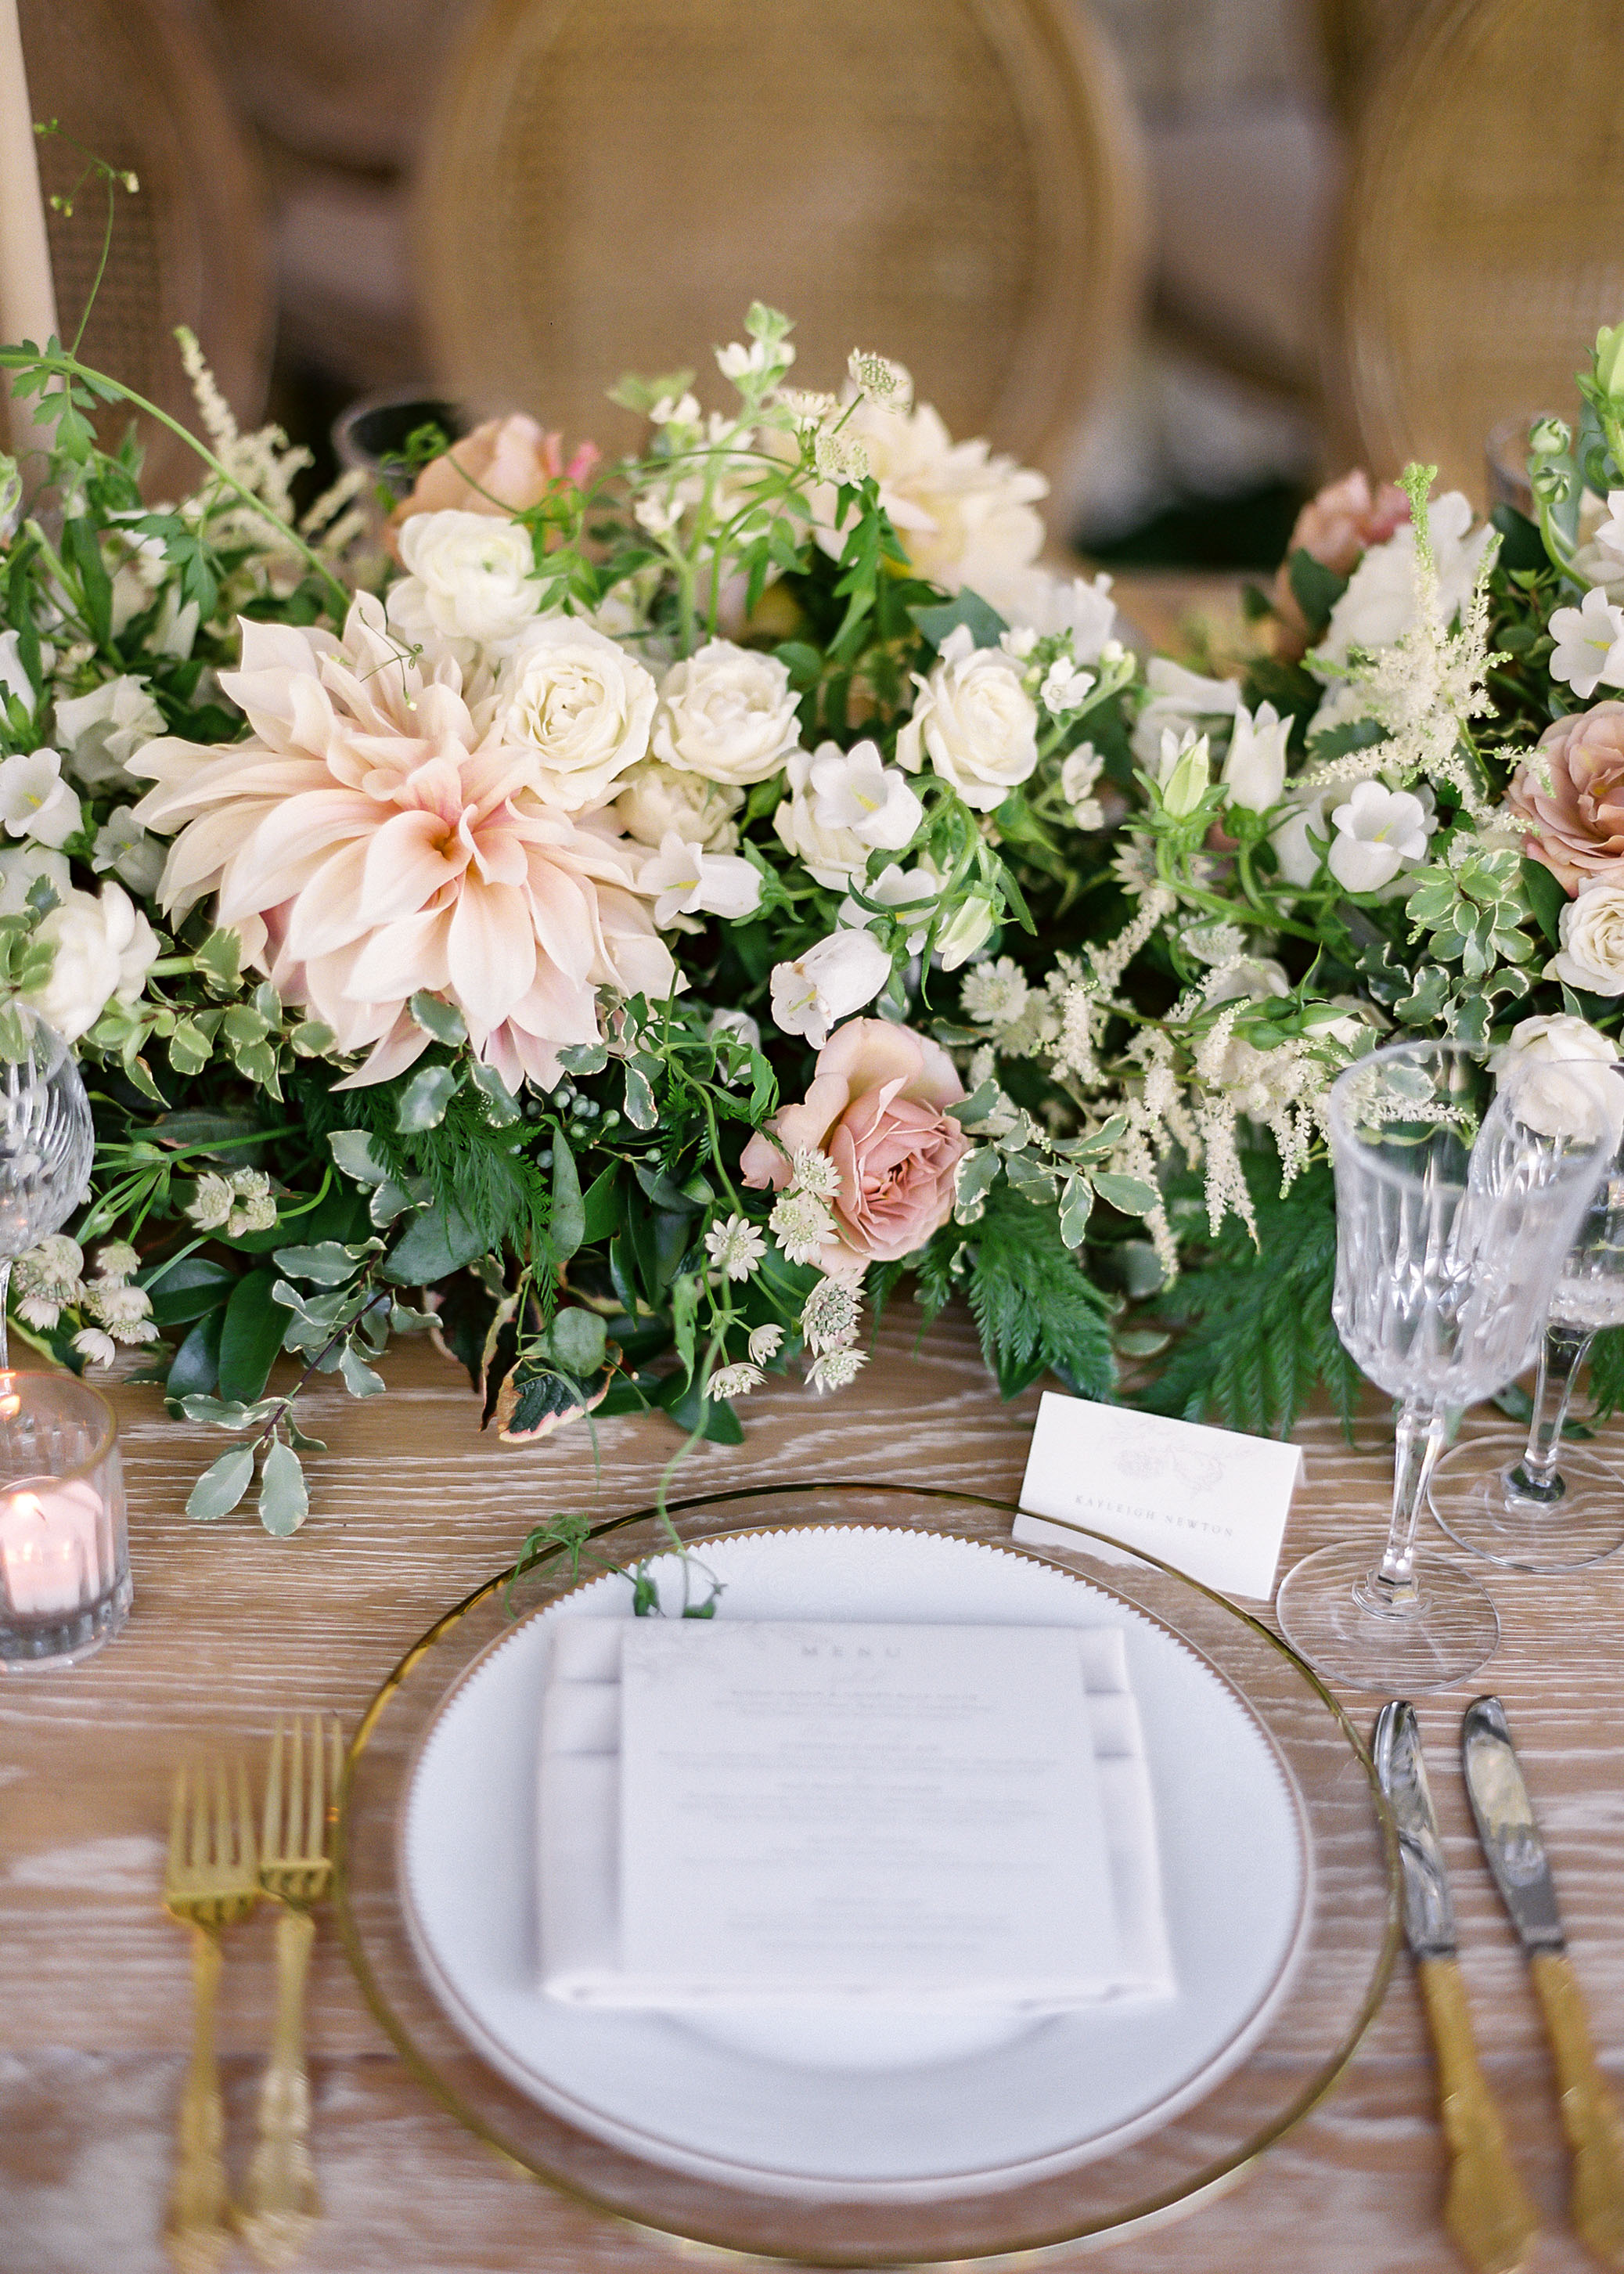 dahlia wedding centerpieces garland table runner setting